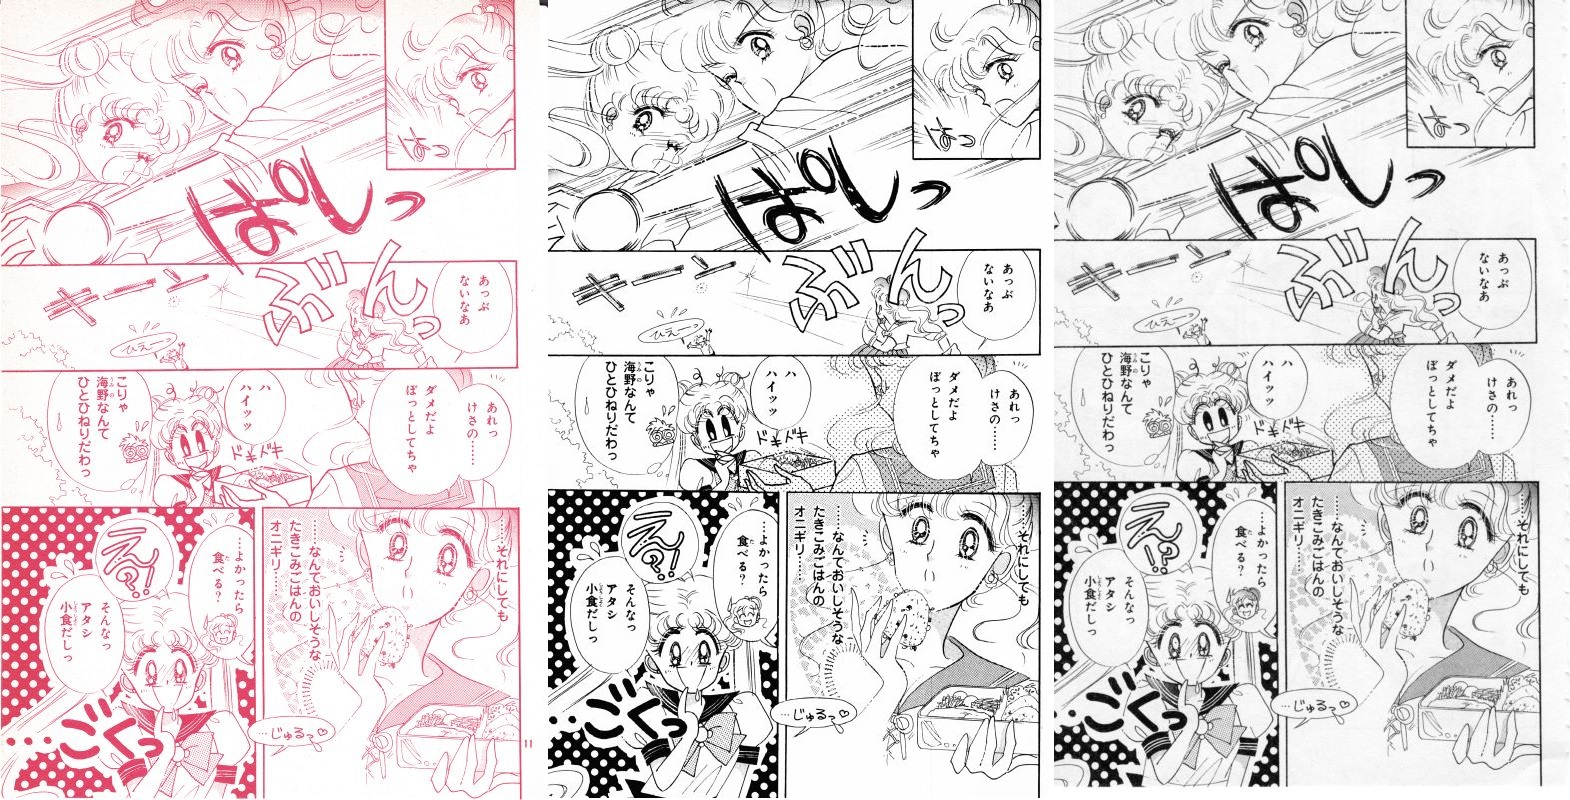 Act 5, Page 9 – Nakayoshi, Original, Remaster